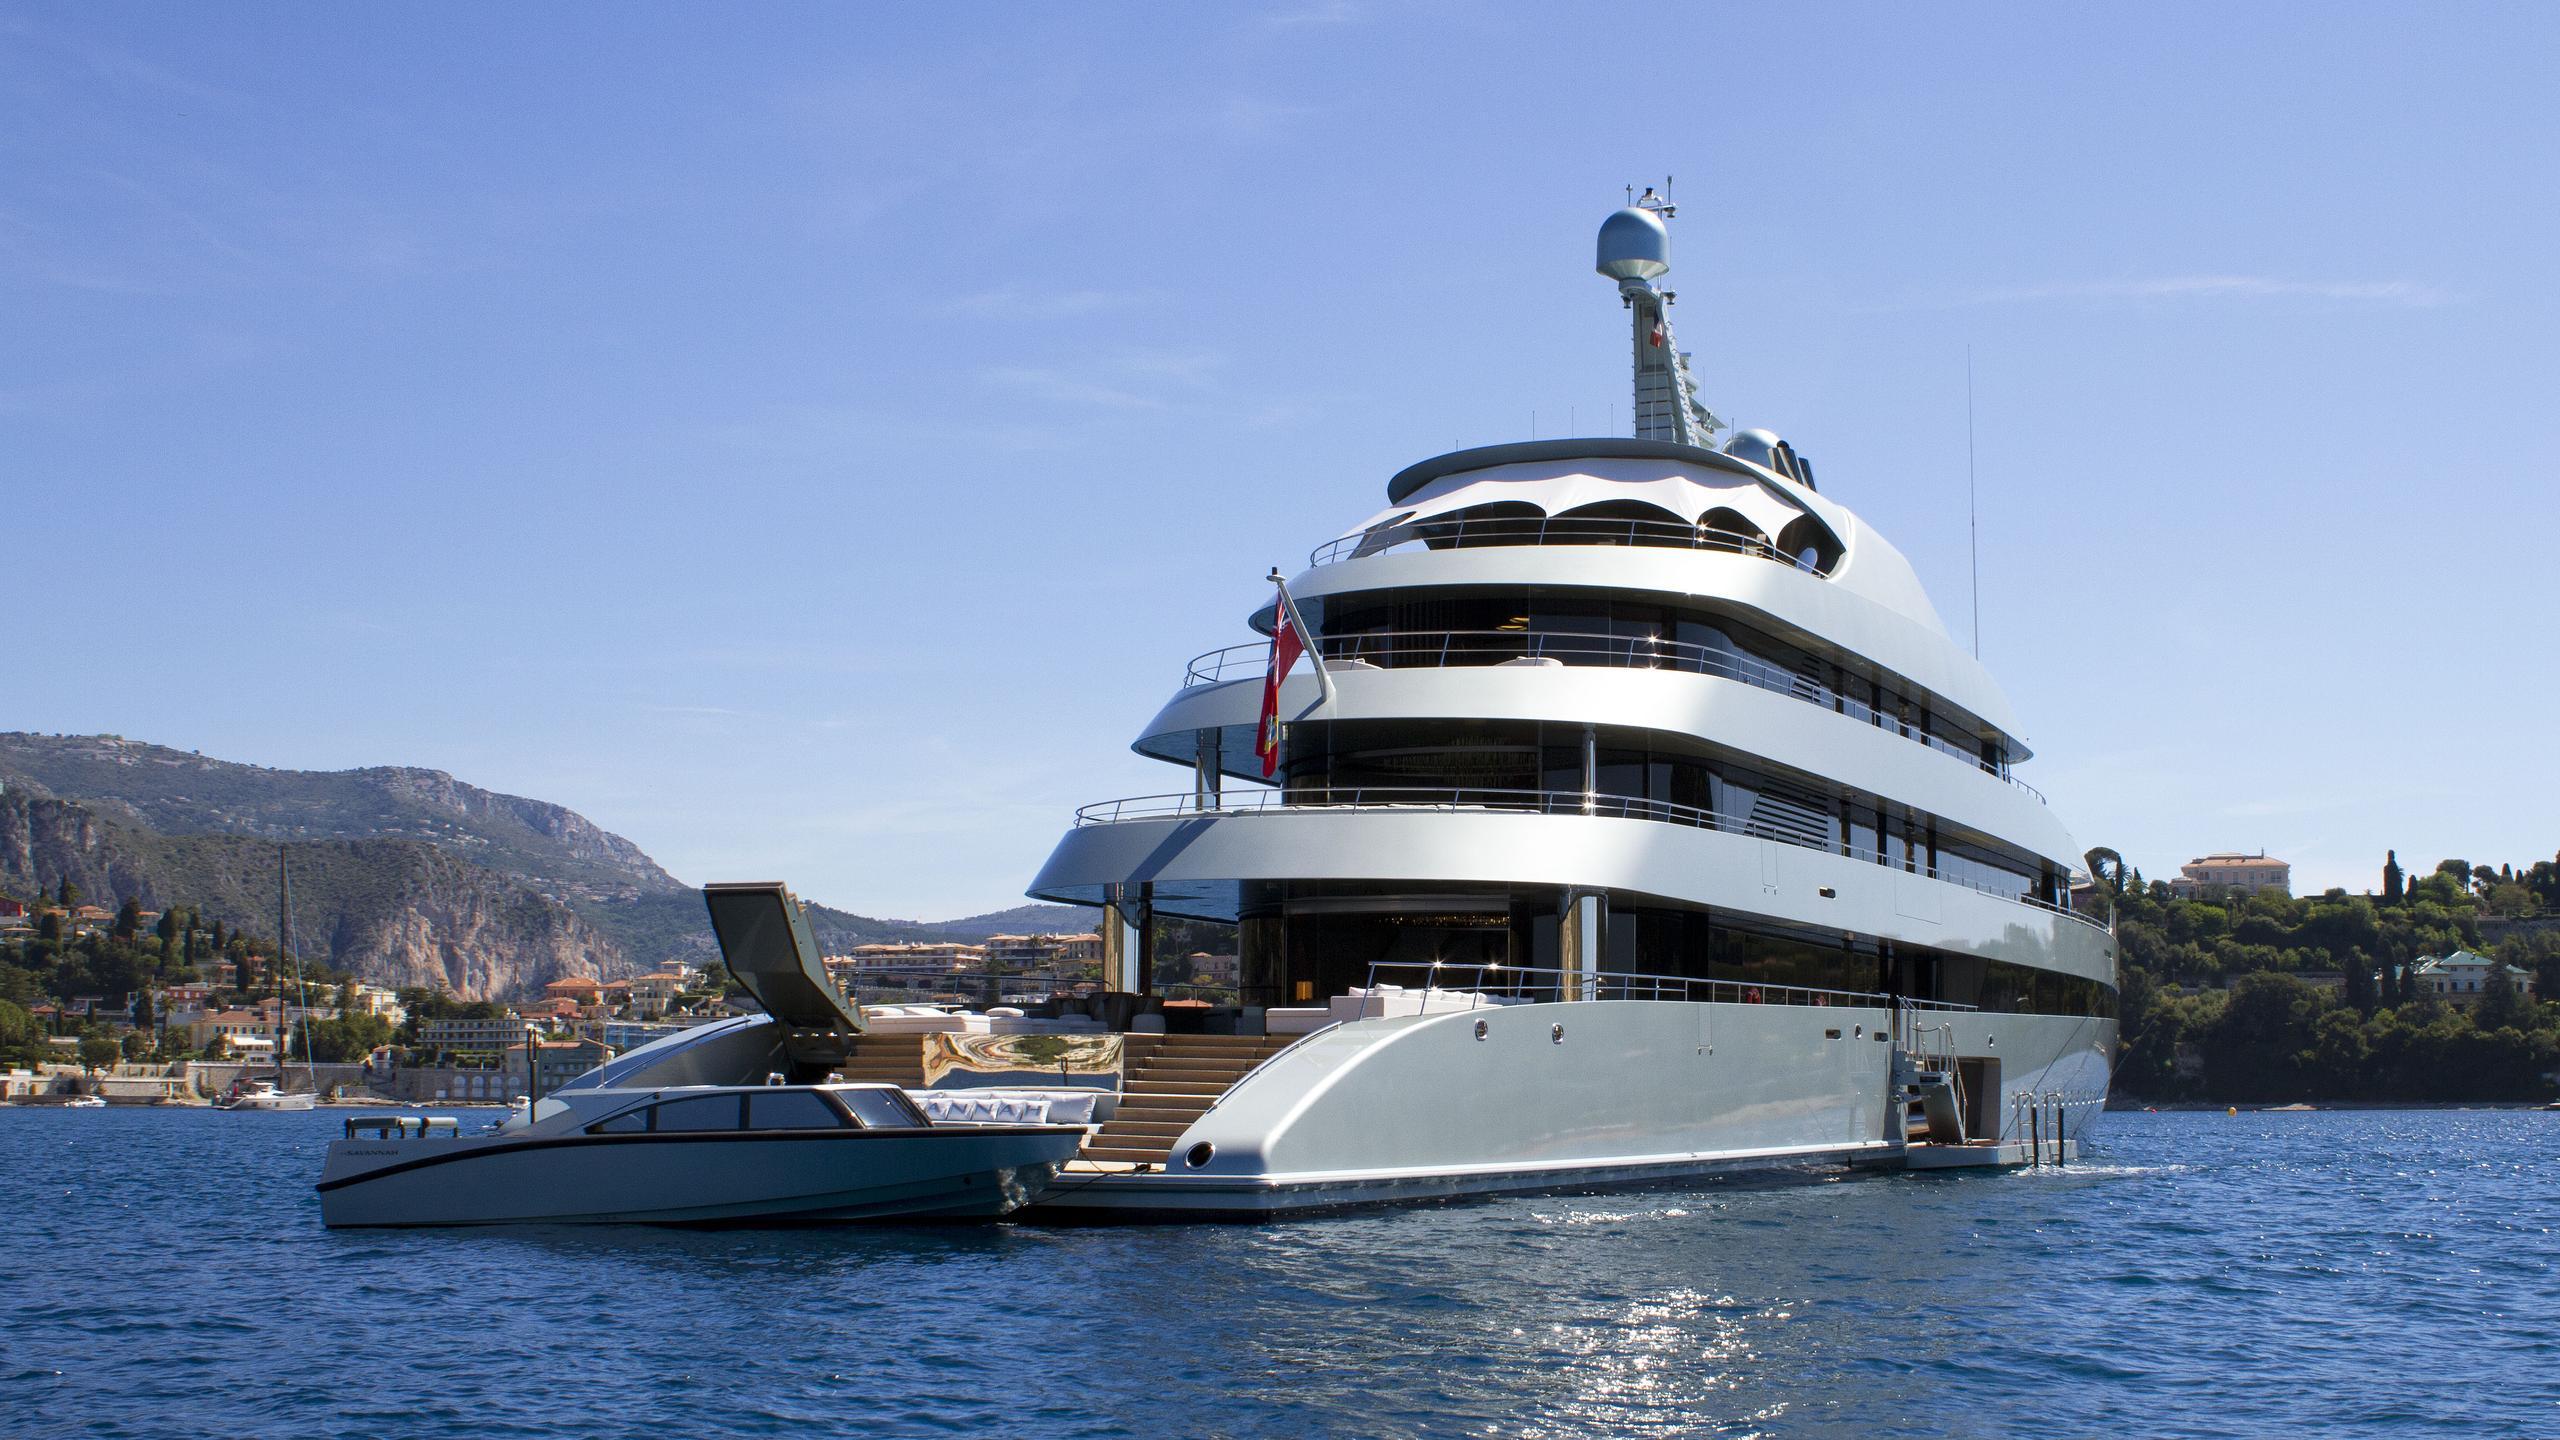 Savannah-motor-yacht-feadship-2015-83m-stern